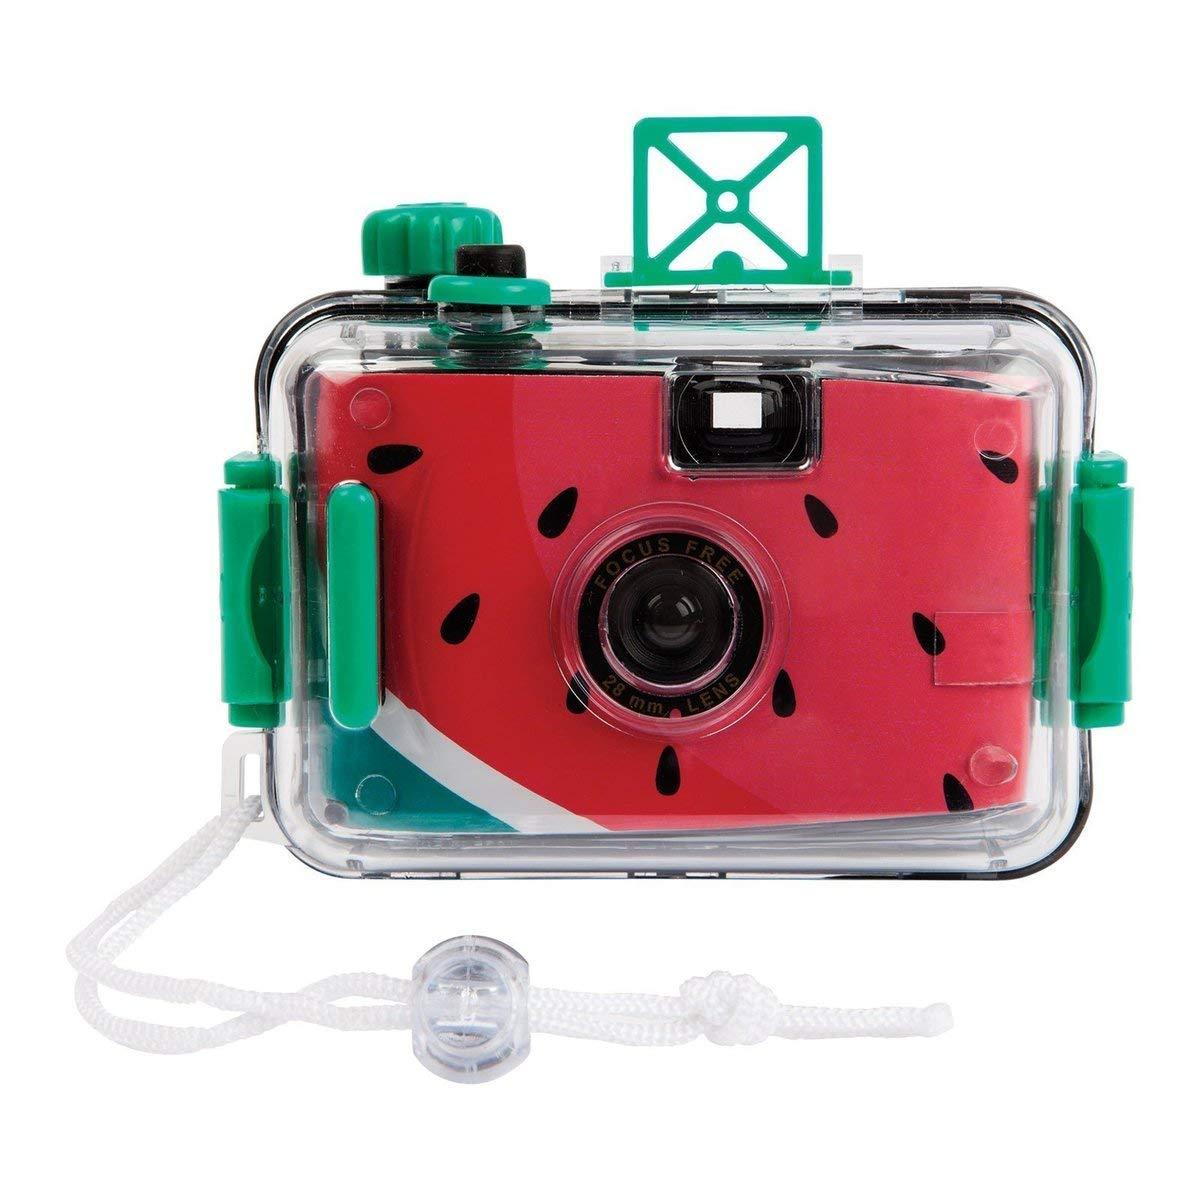 SunnyLIFE Underwater Camera Watermelon by SunnyLIFE